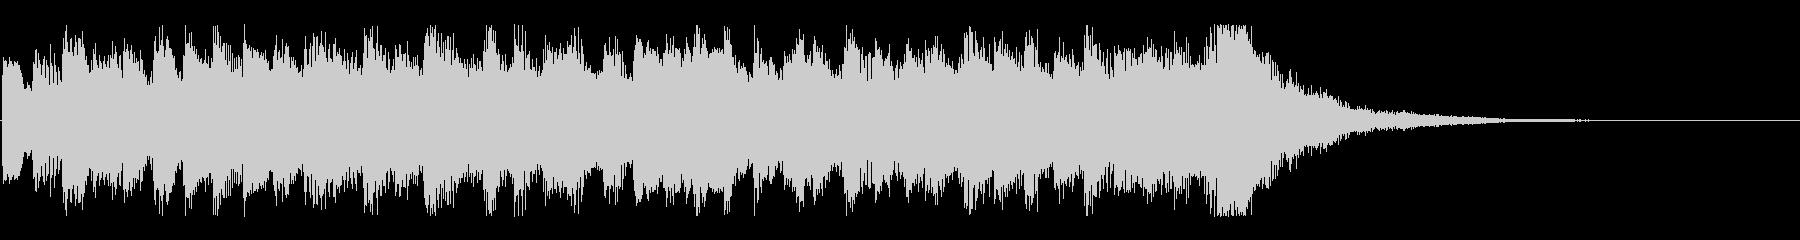 KANT電車発車音系メロディ1の未再生の波形